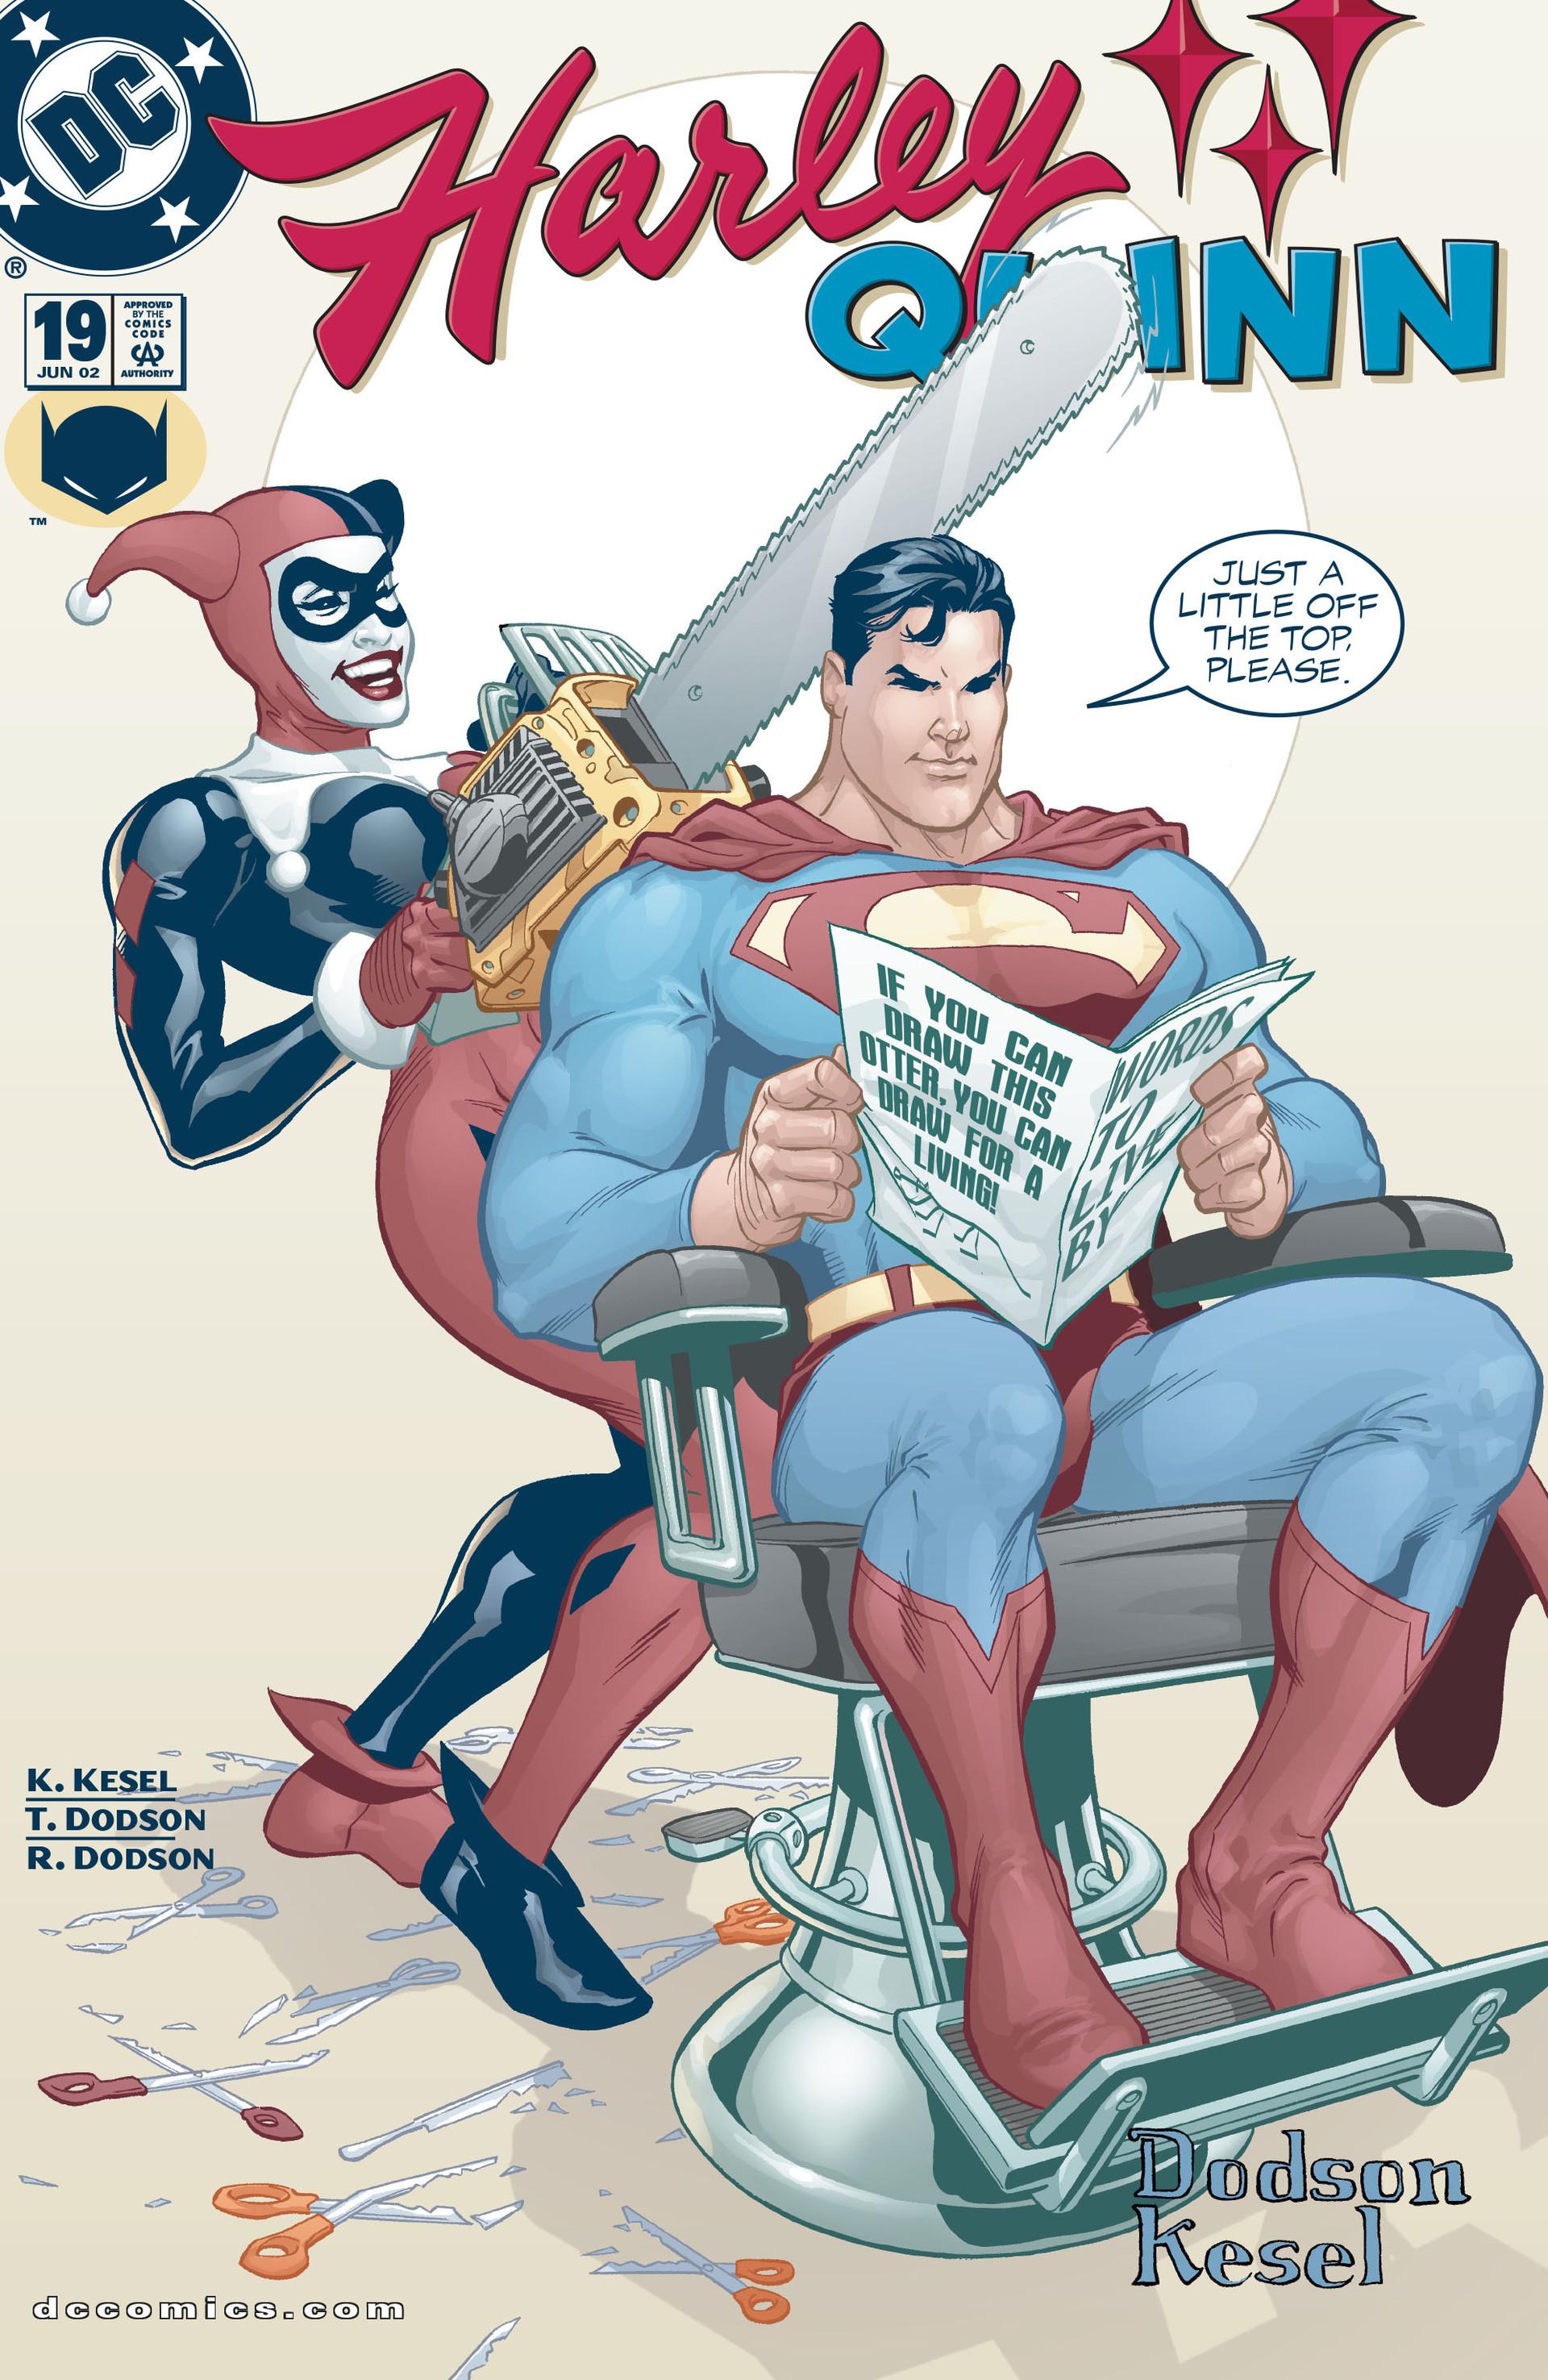 Harley Quinn Vol.1 #19